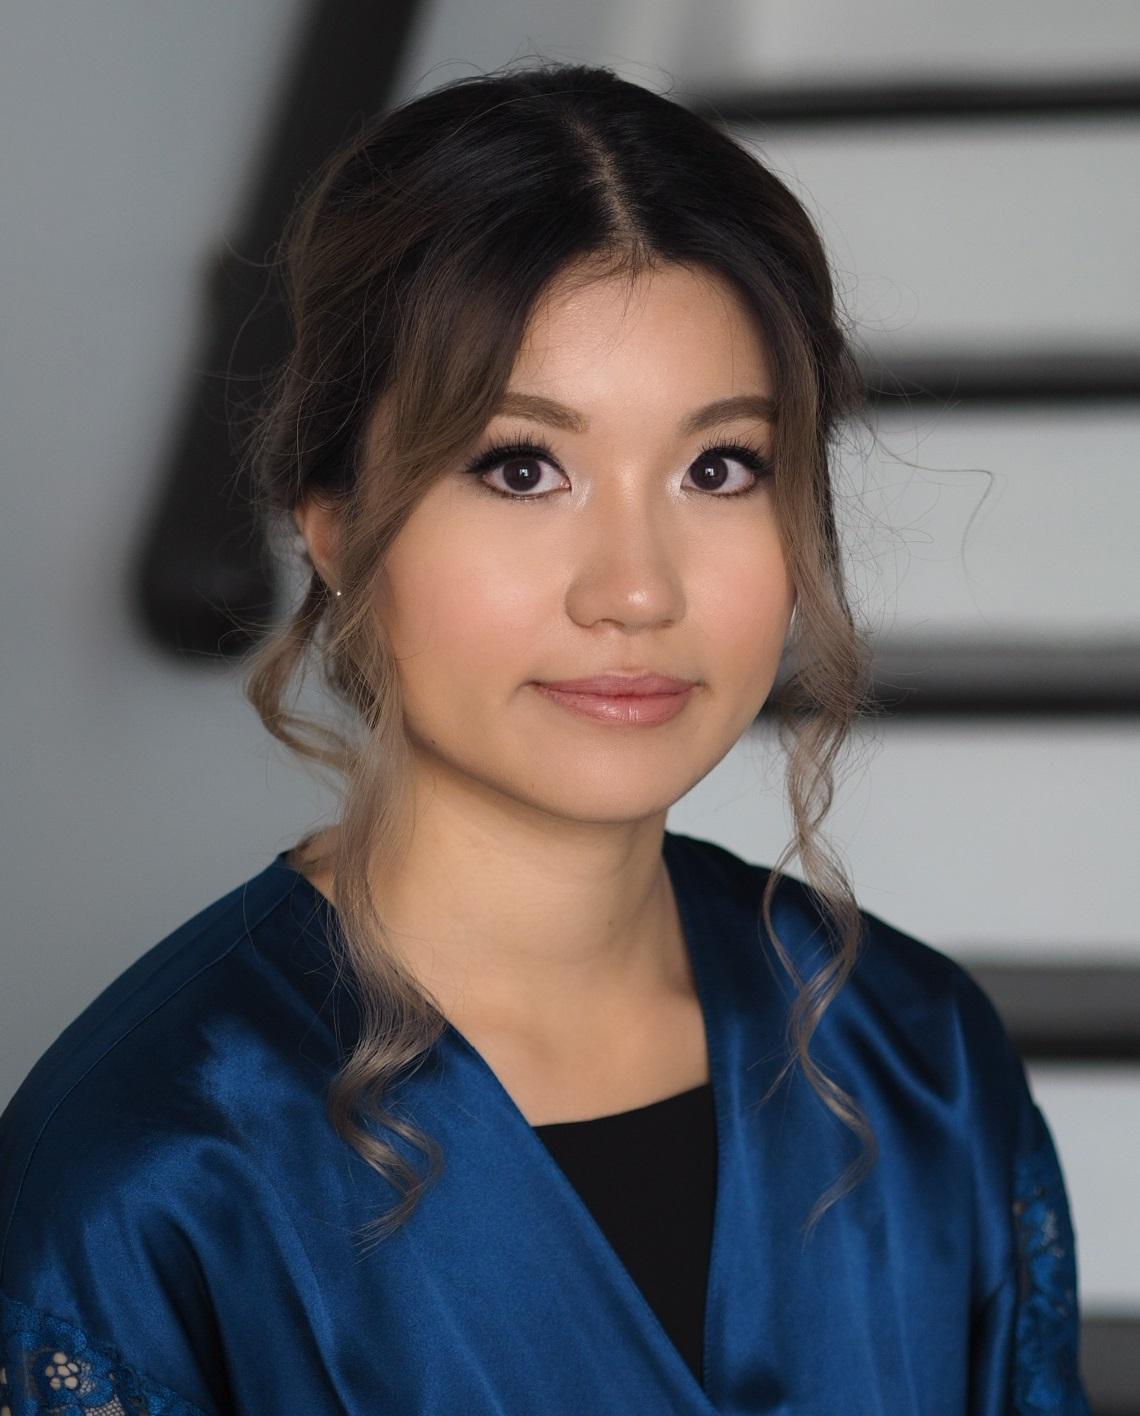 Vietnamese makeup Toronto bridesmaid